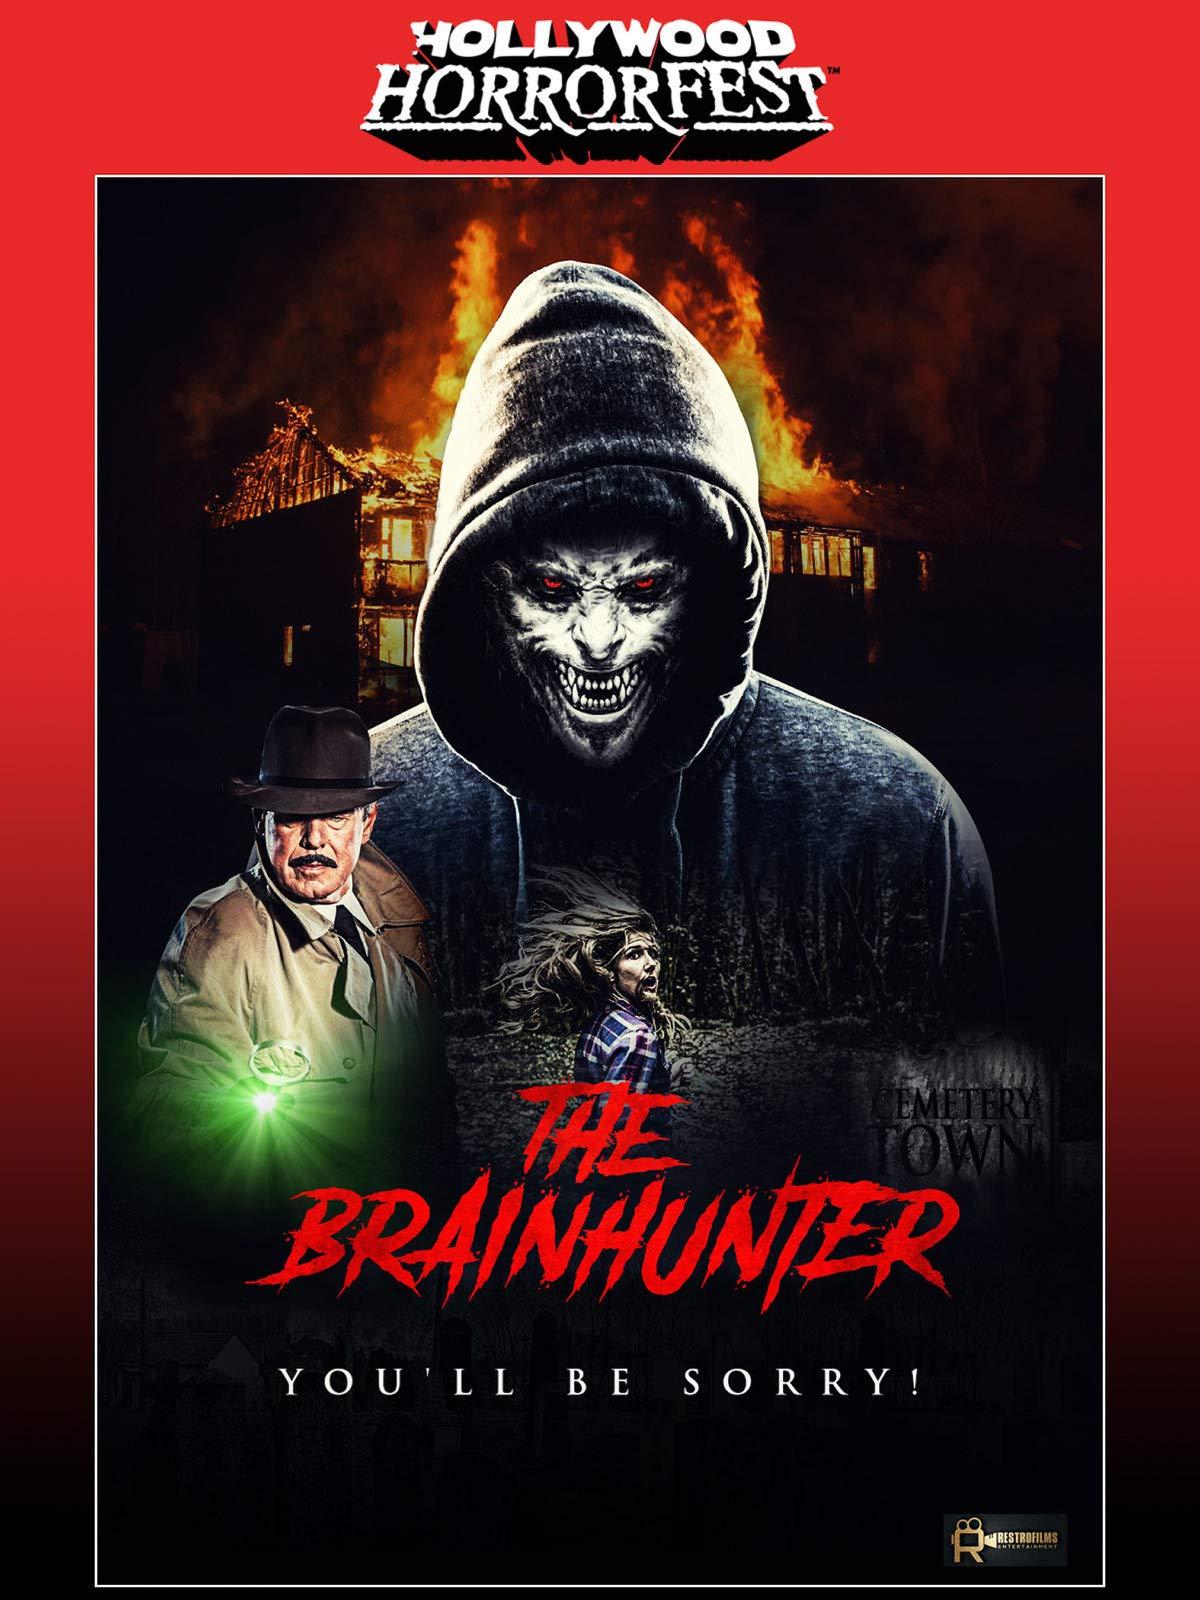 Hollywood HorrFest Presents: The Brain Hunter